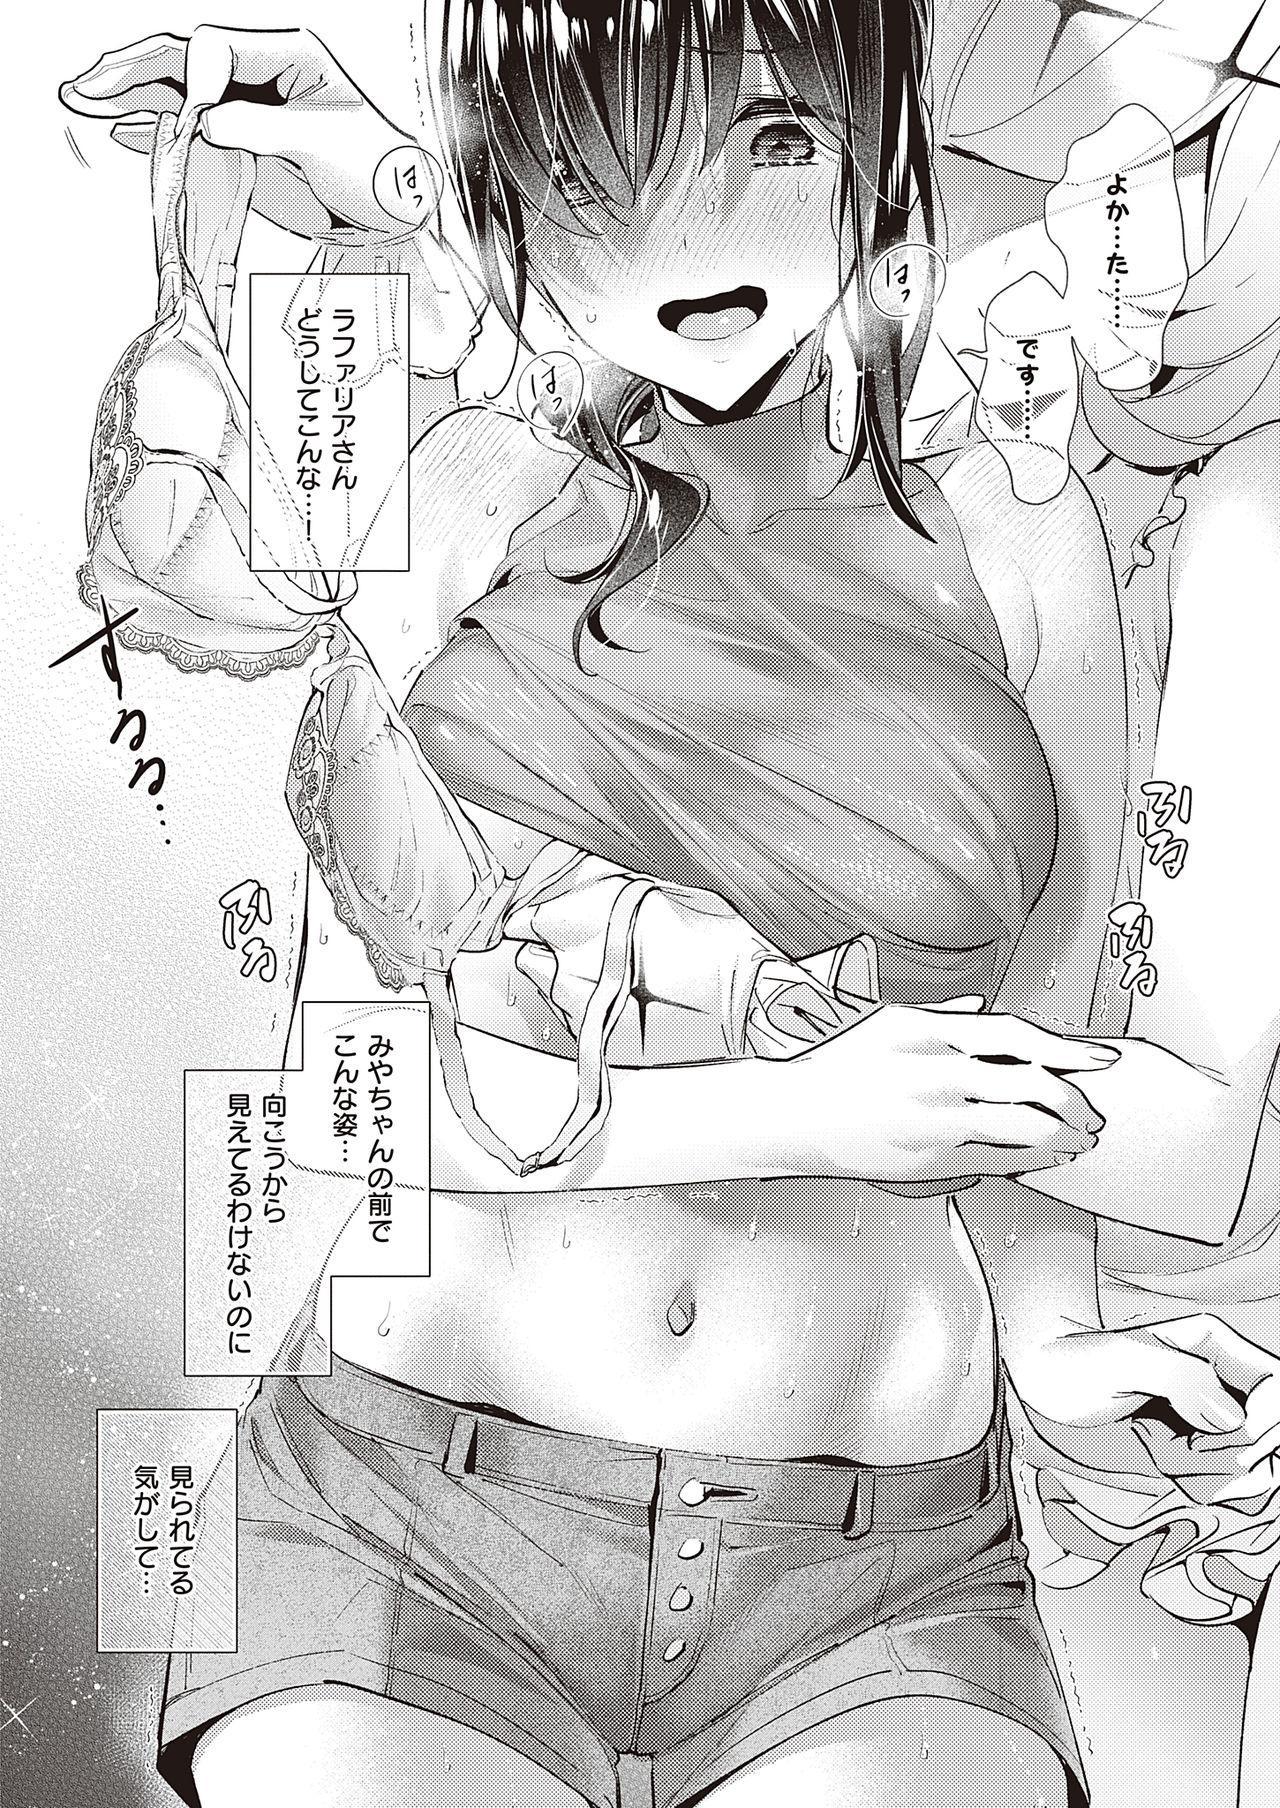 Yokubou Pandora Chapter 13 11